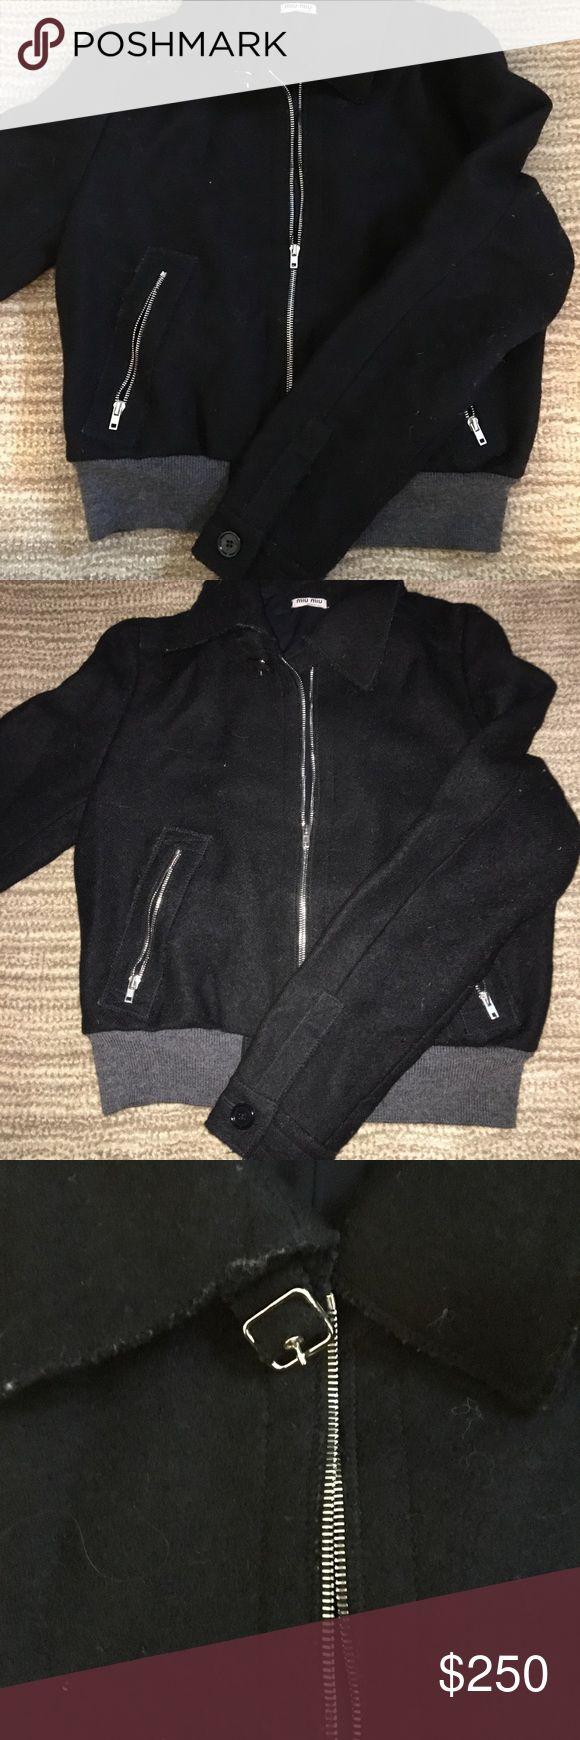 Miu Miu Wool Bomber Jacket - Fantastic Shape! Warm and beautiful Miu Miu bomber jacket with silver detailing. Size 44. Message me if you'd like to see any more pictures! Miu Miu Jackets & Coats